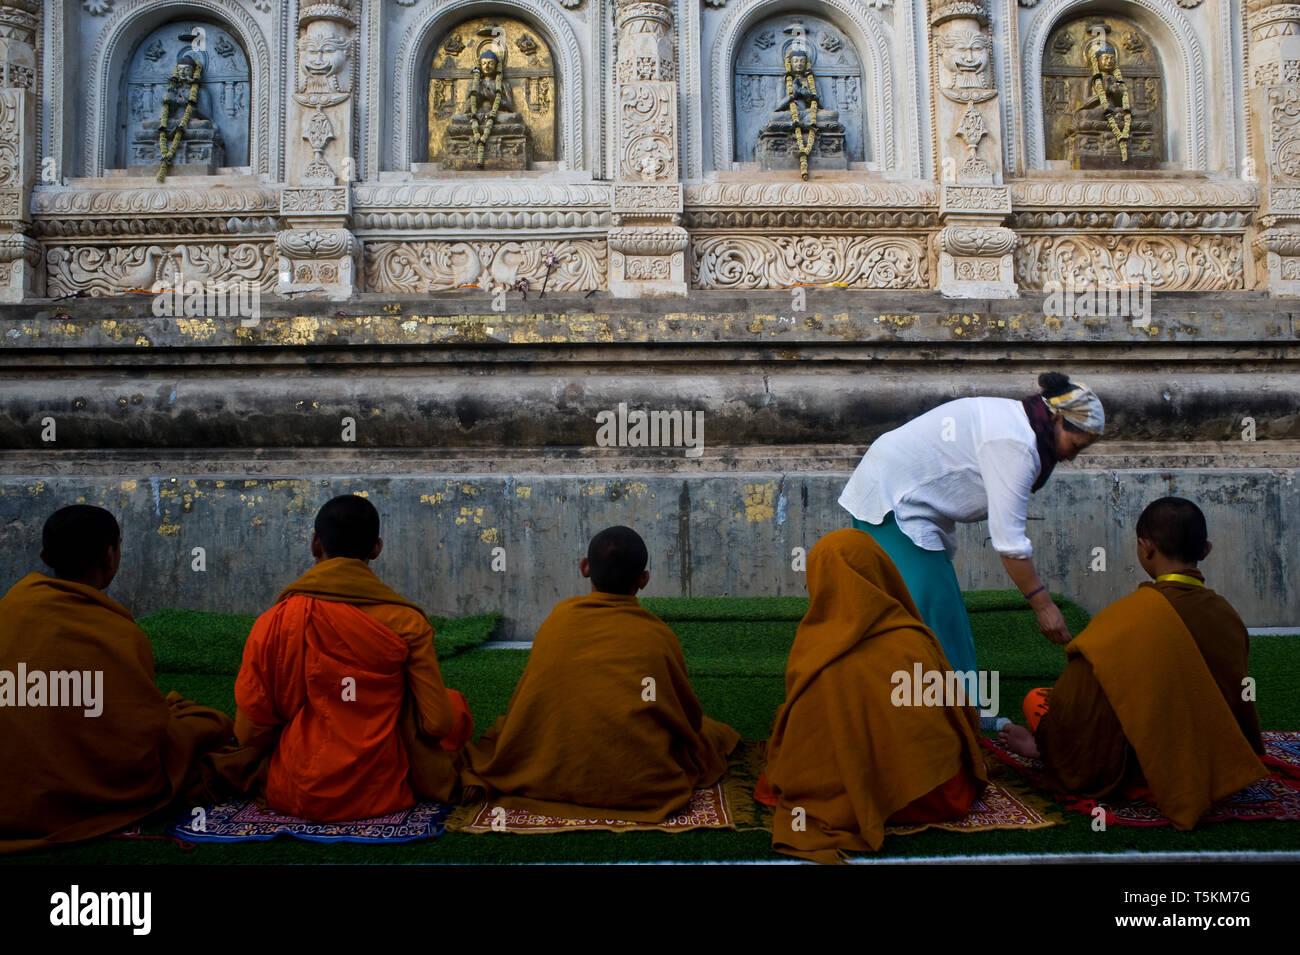 Buddhist boys are receiving alms at the Mahabodhi temple ( Bodhgaya, India) Stock Photo